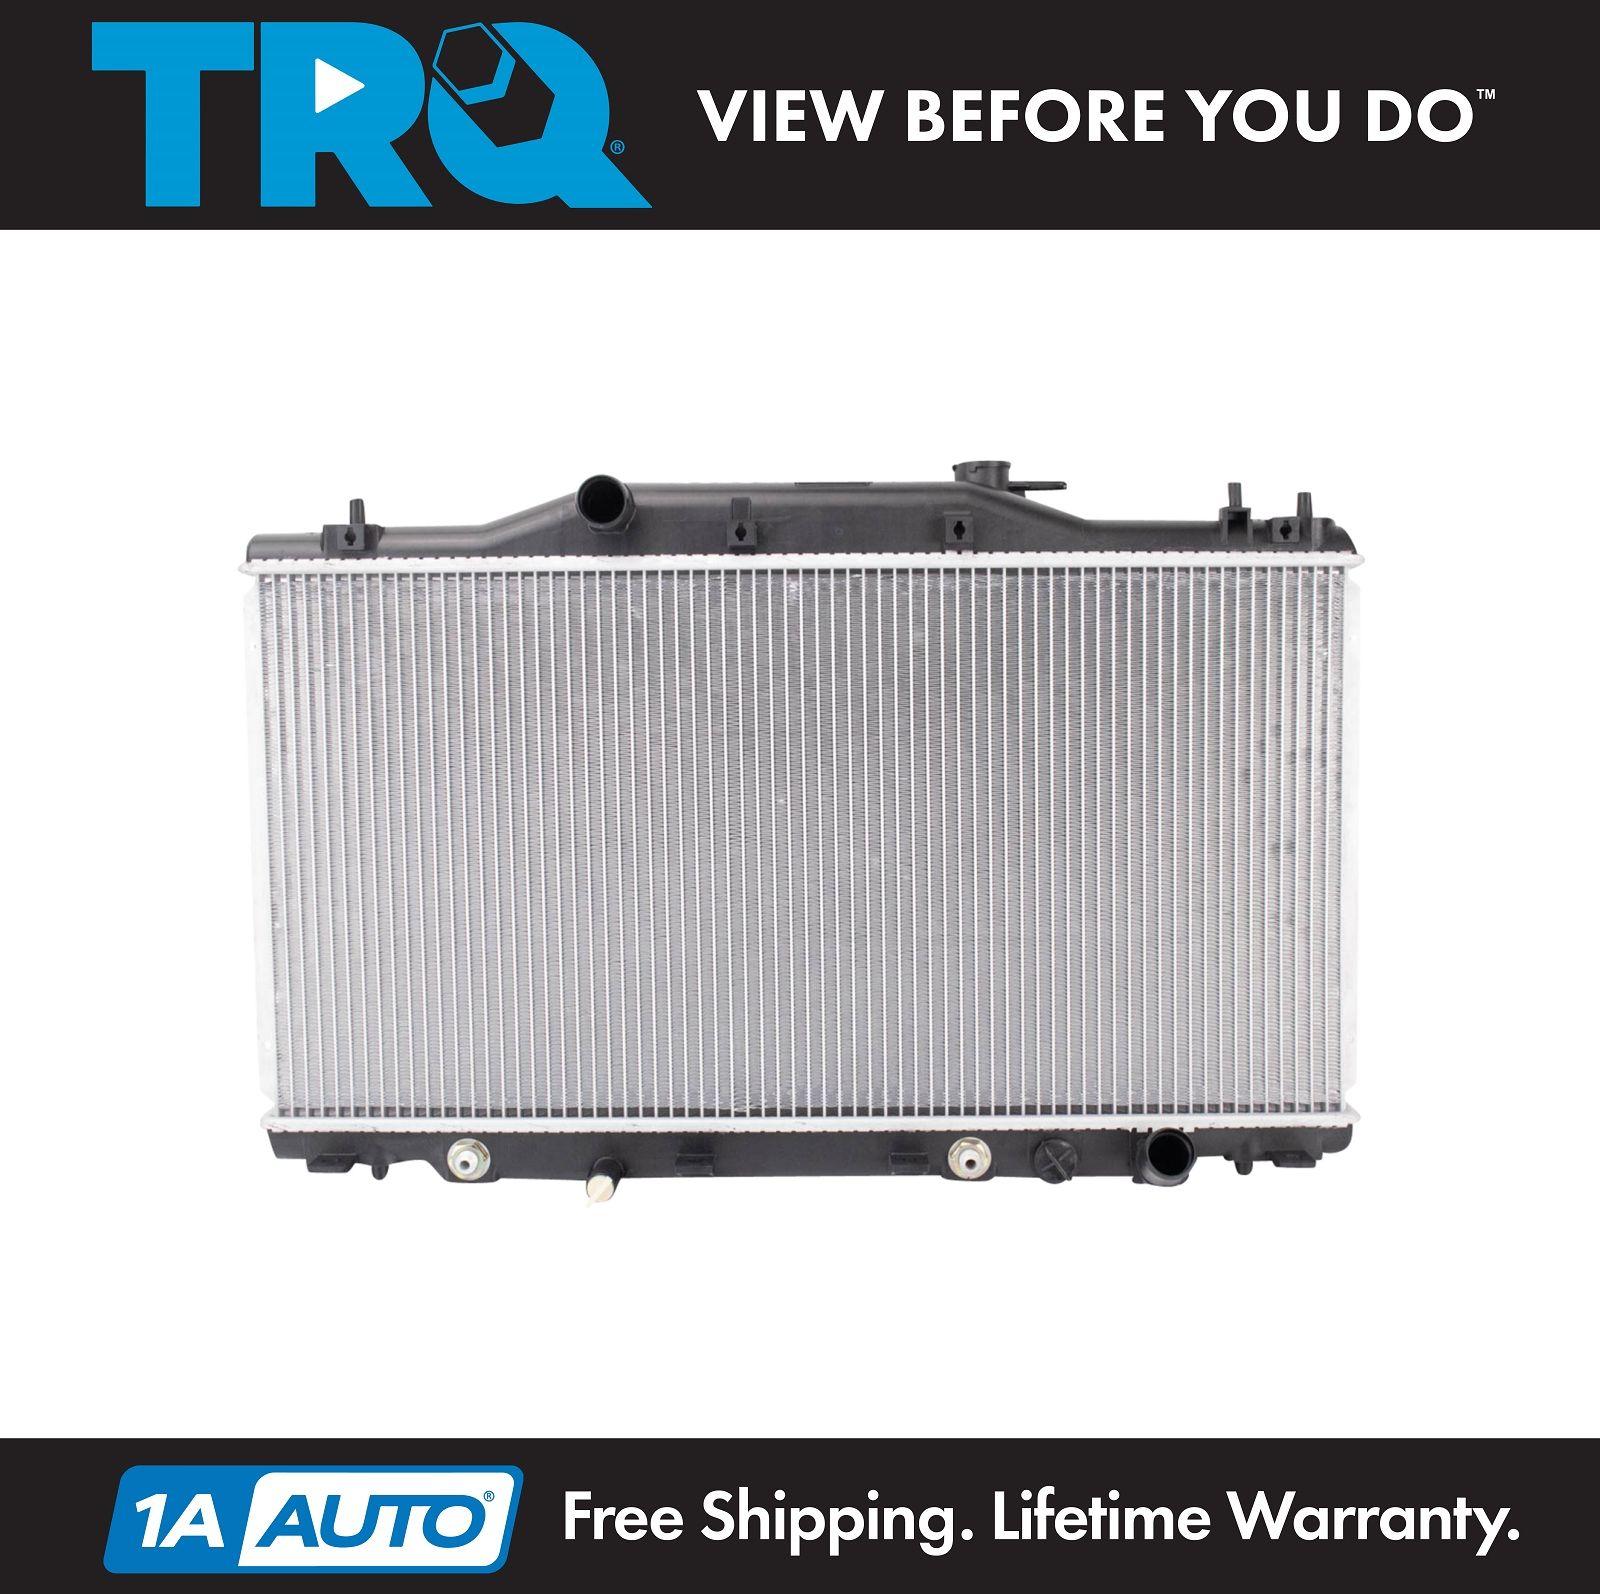 Radiator Assembly Plastic Tanks Aluminum Core Direct Fit